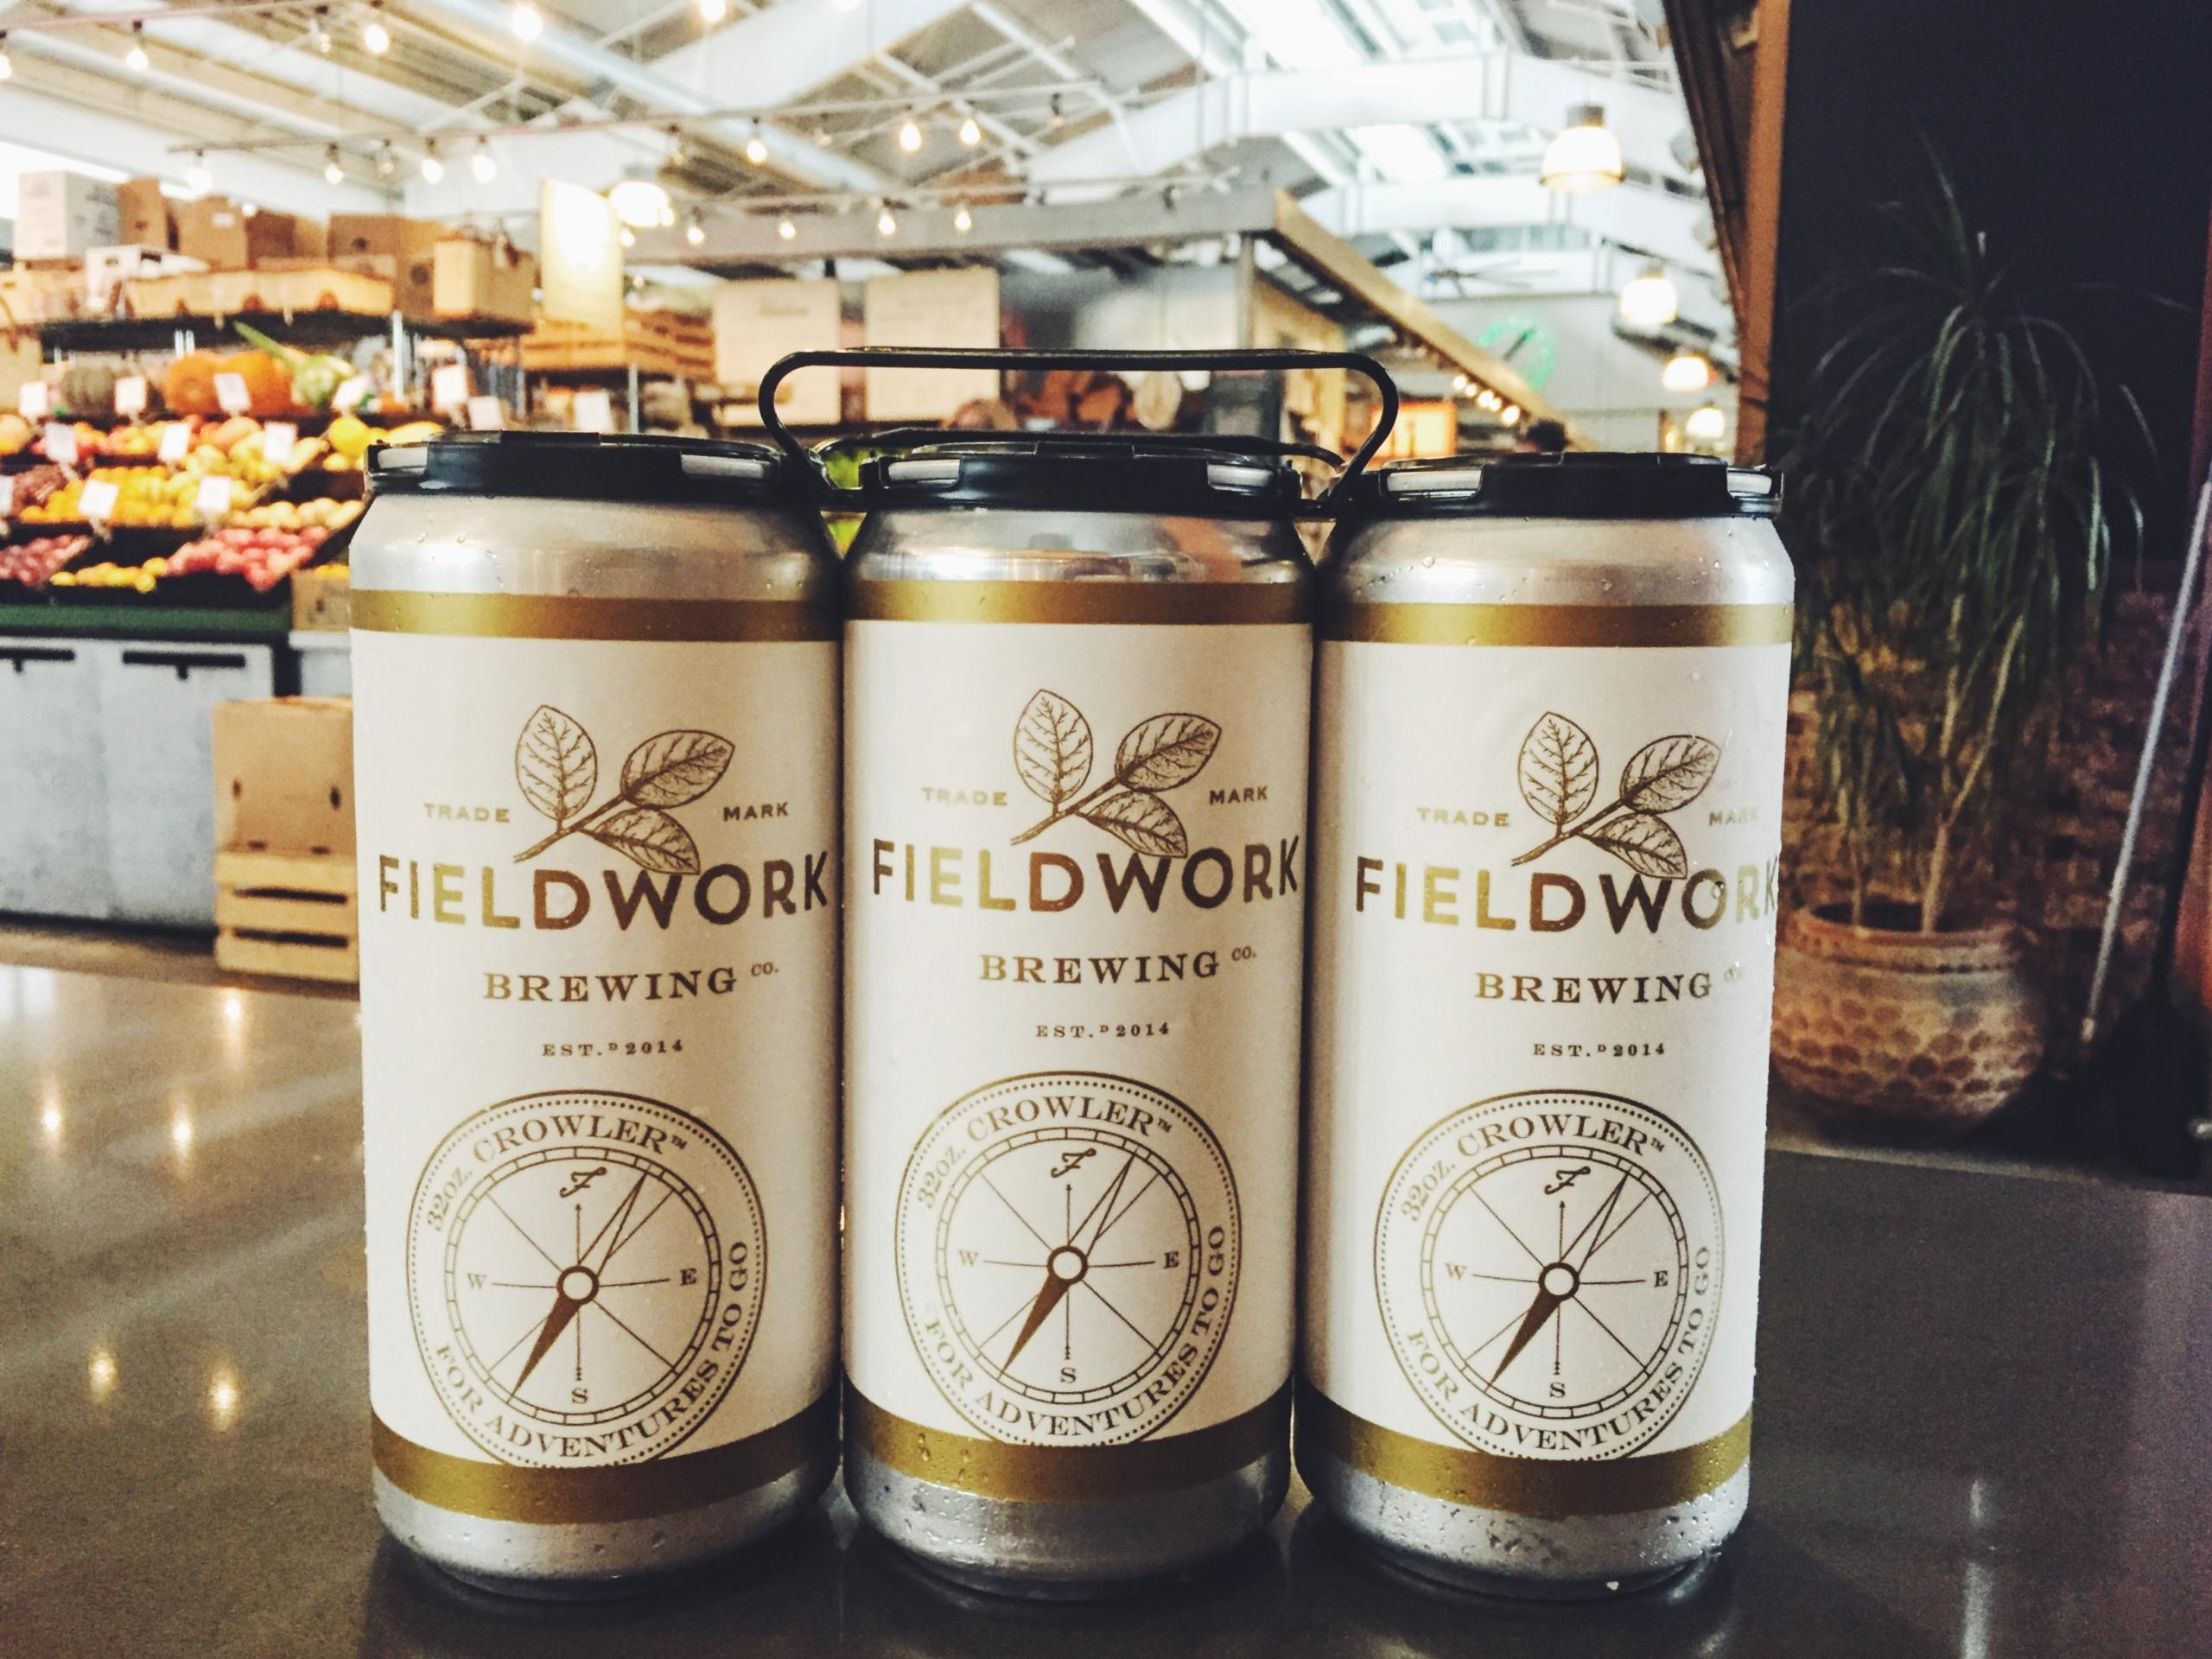 Fieldwork Brewing Beer To Go